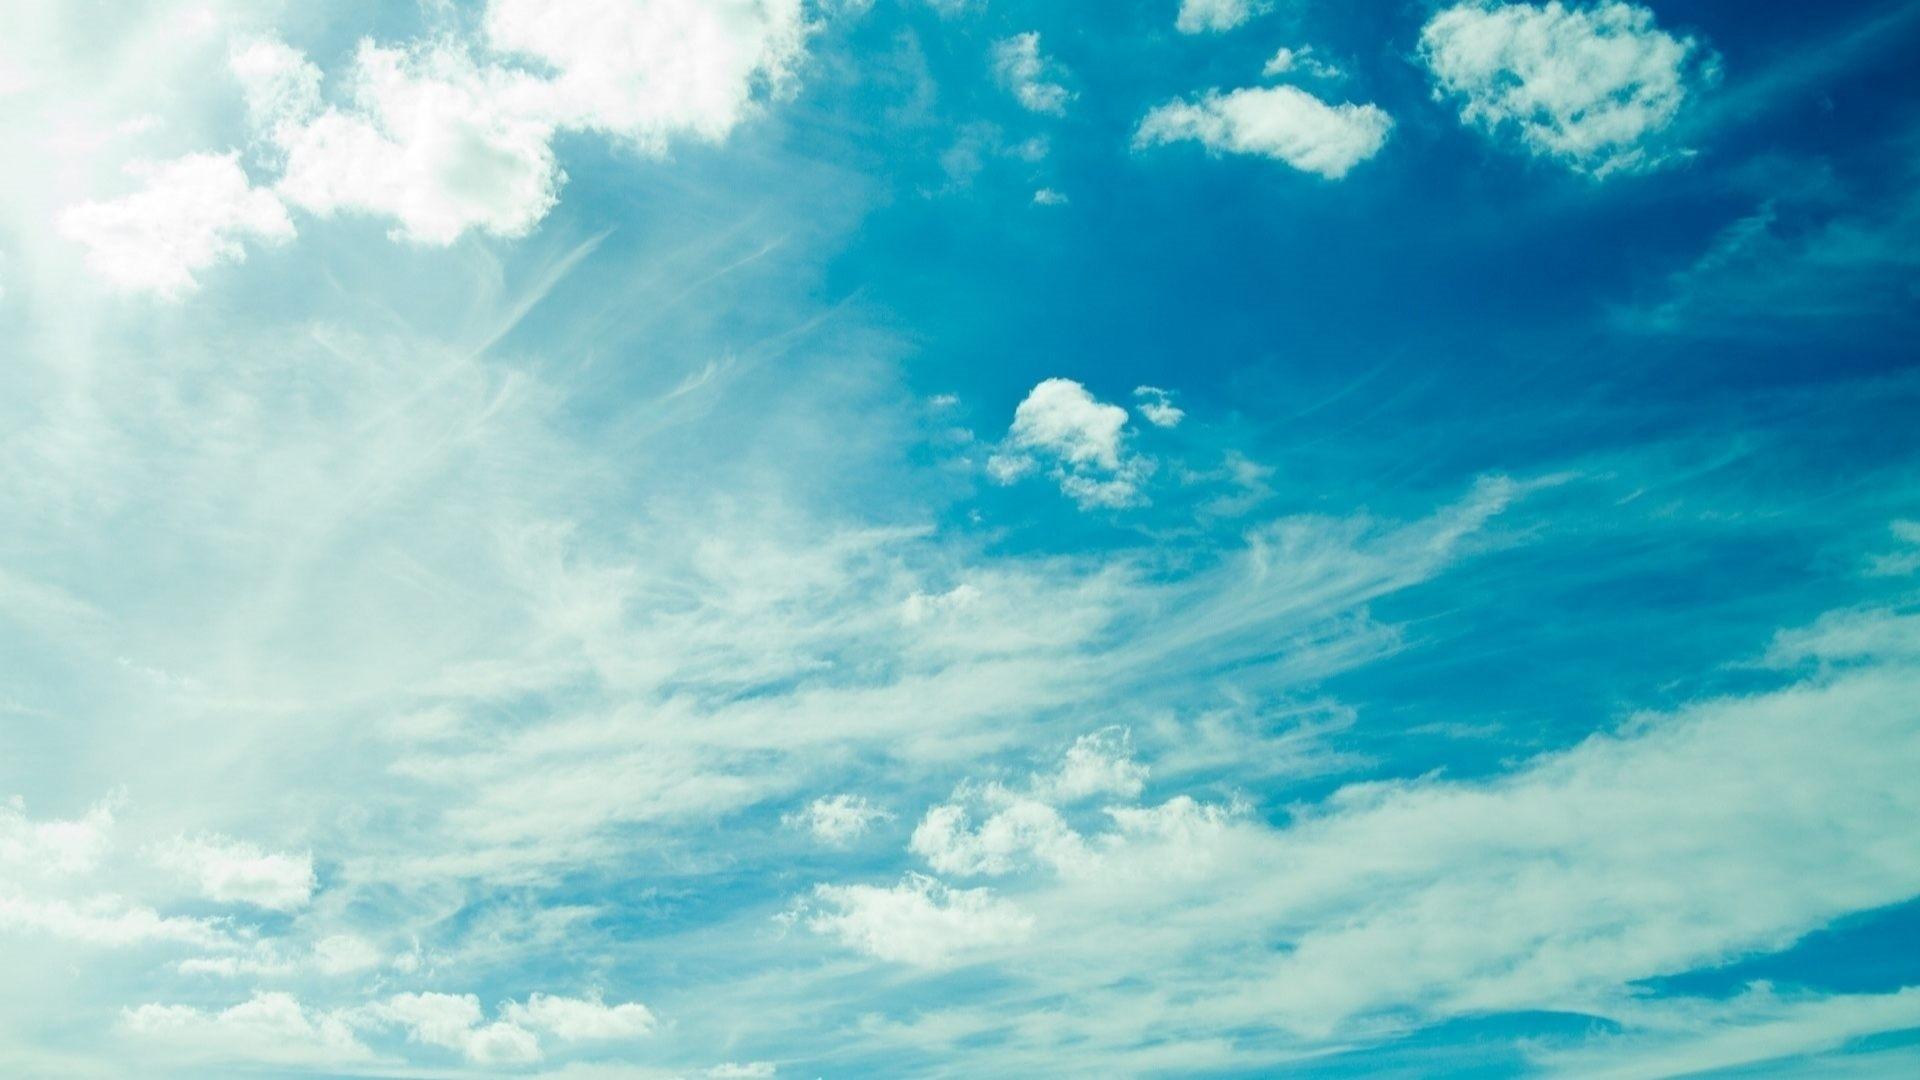 Blue Cloud computer wallpaper